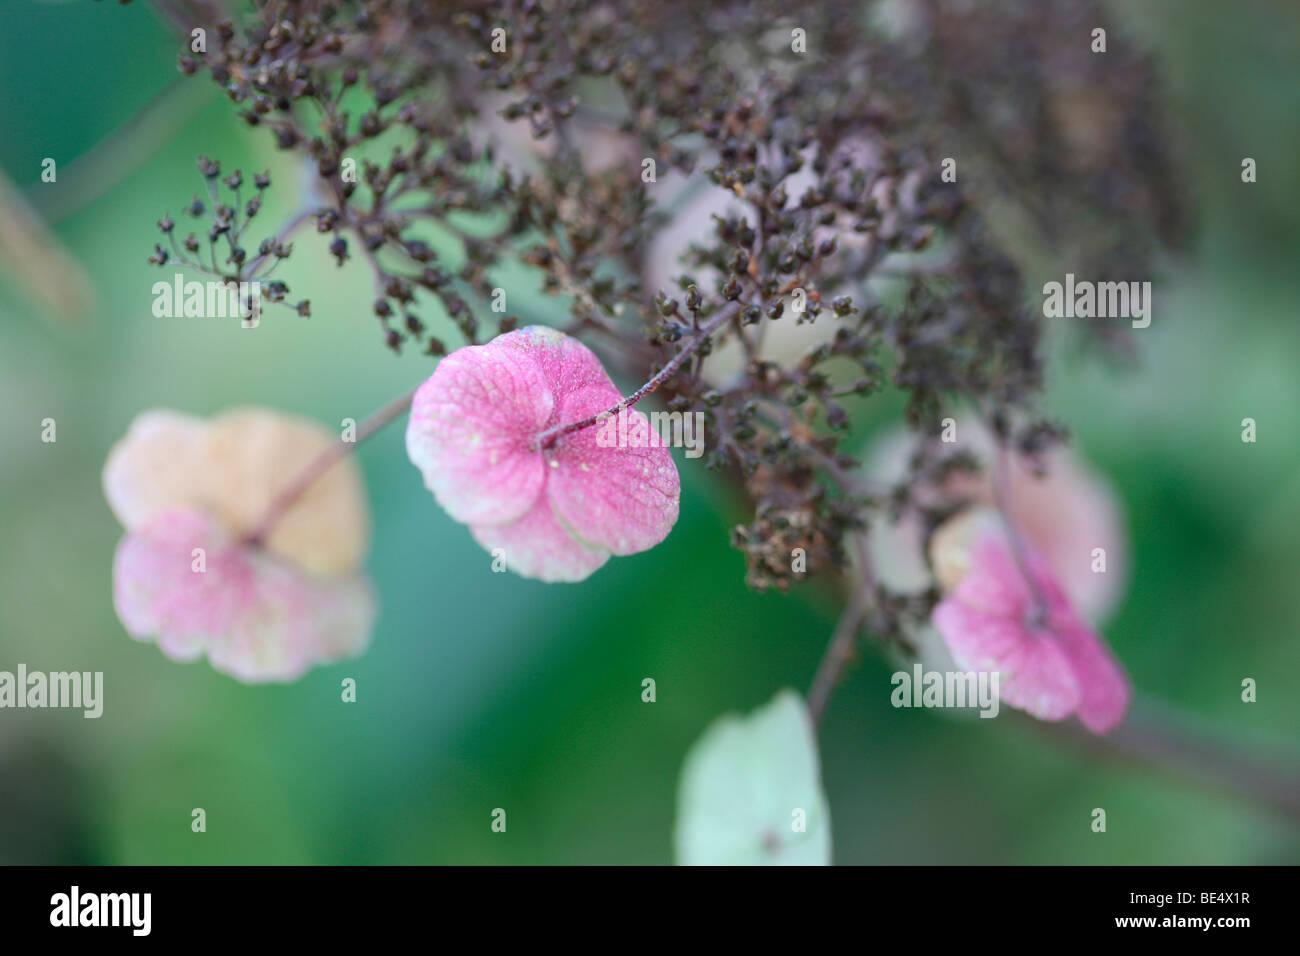 Delightful Flowering Wild Hydrangea Sargentiana Rustic Plant-fine art photography Jane-Ann Butler Photography JABP608 - Stock Image